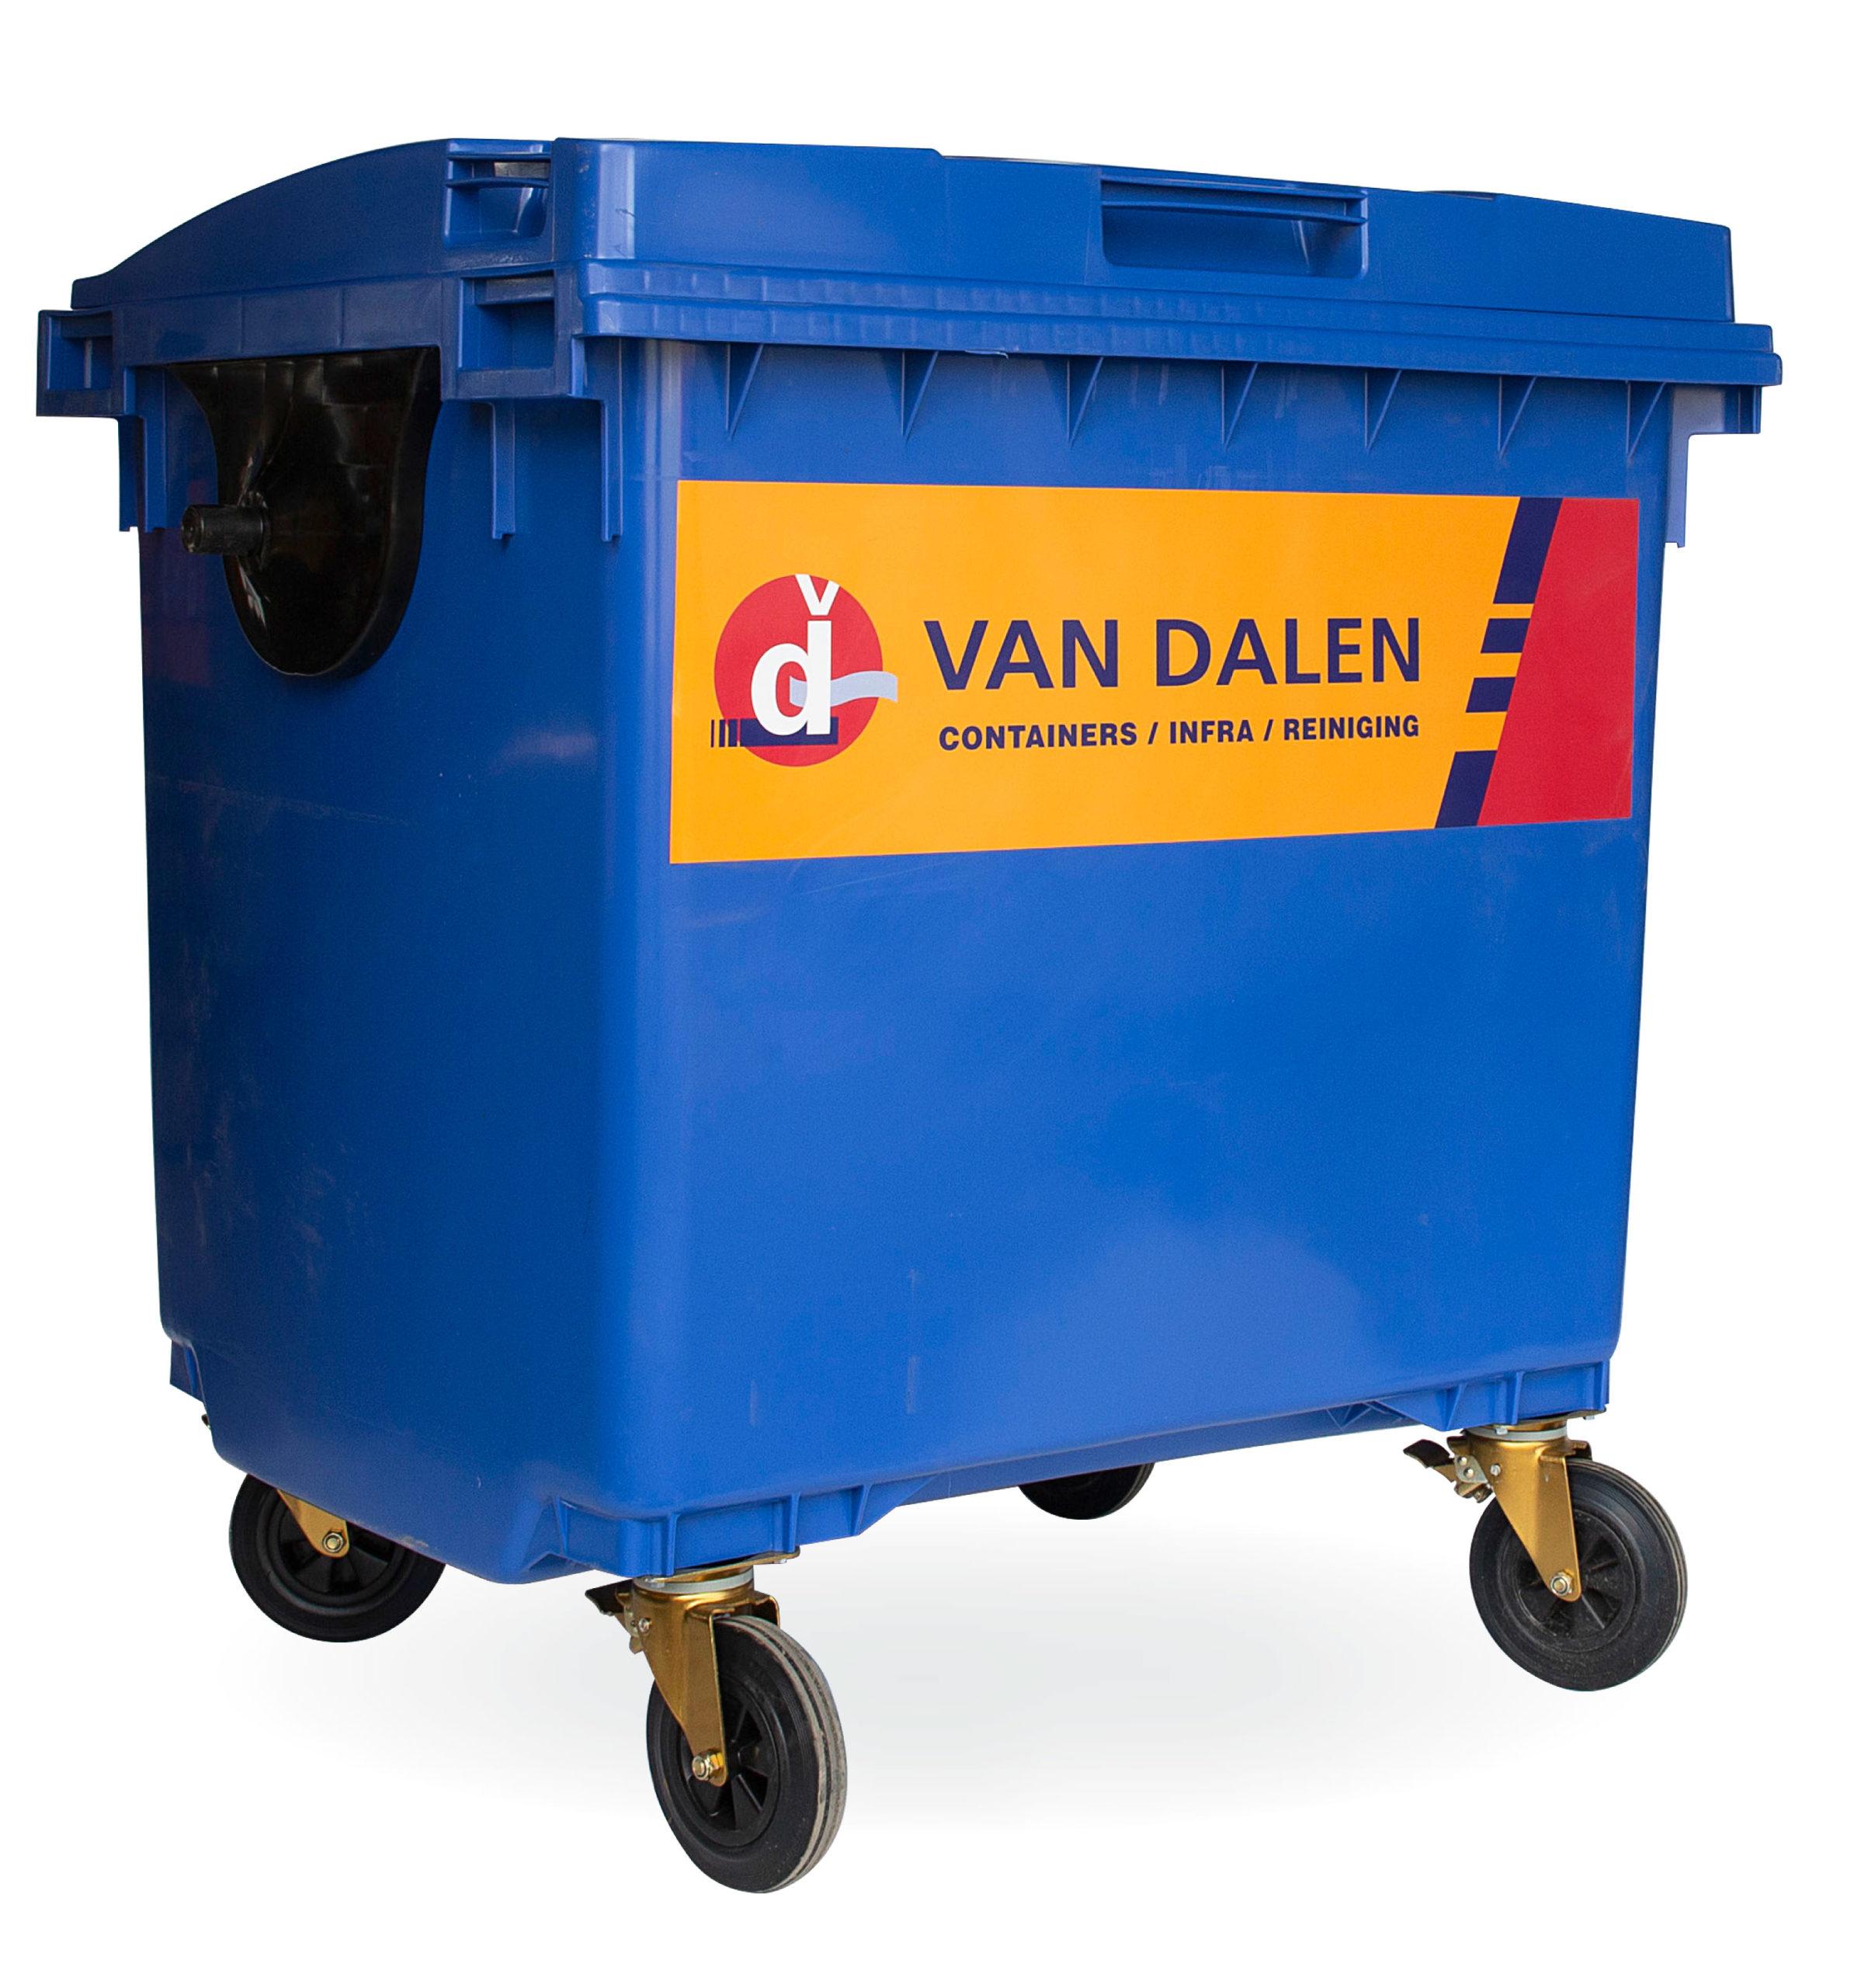 Rolcontainer 770 liter - Papier